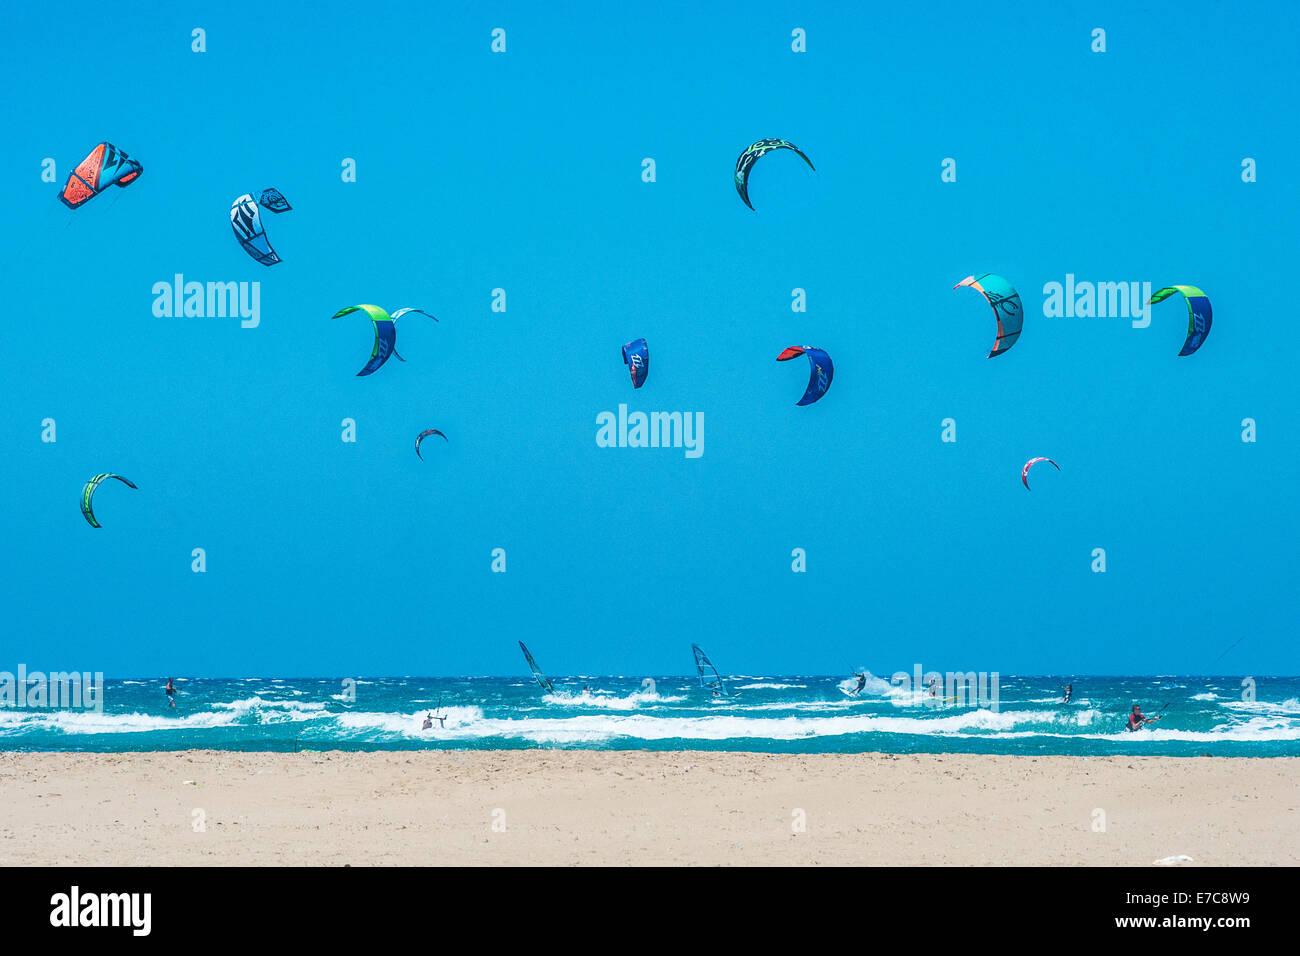 Kitesurf y windsurf en Rodas, Grecia Imagen De Stock